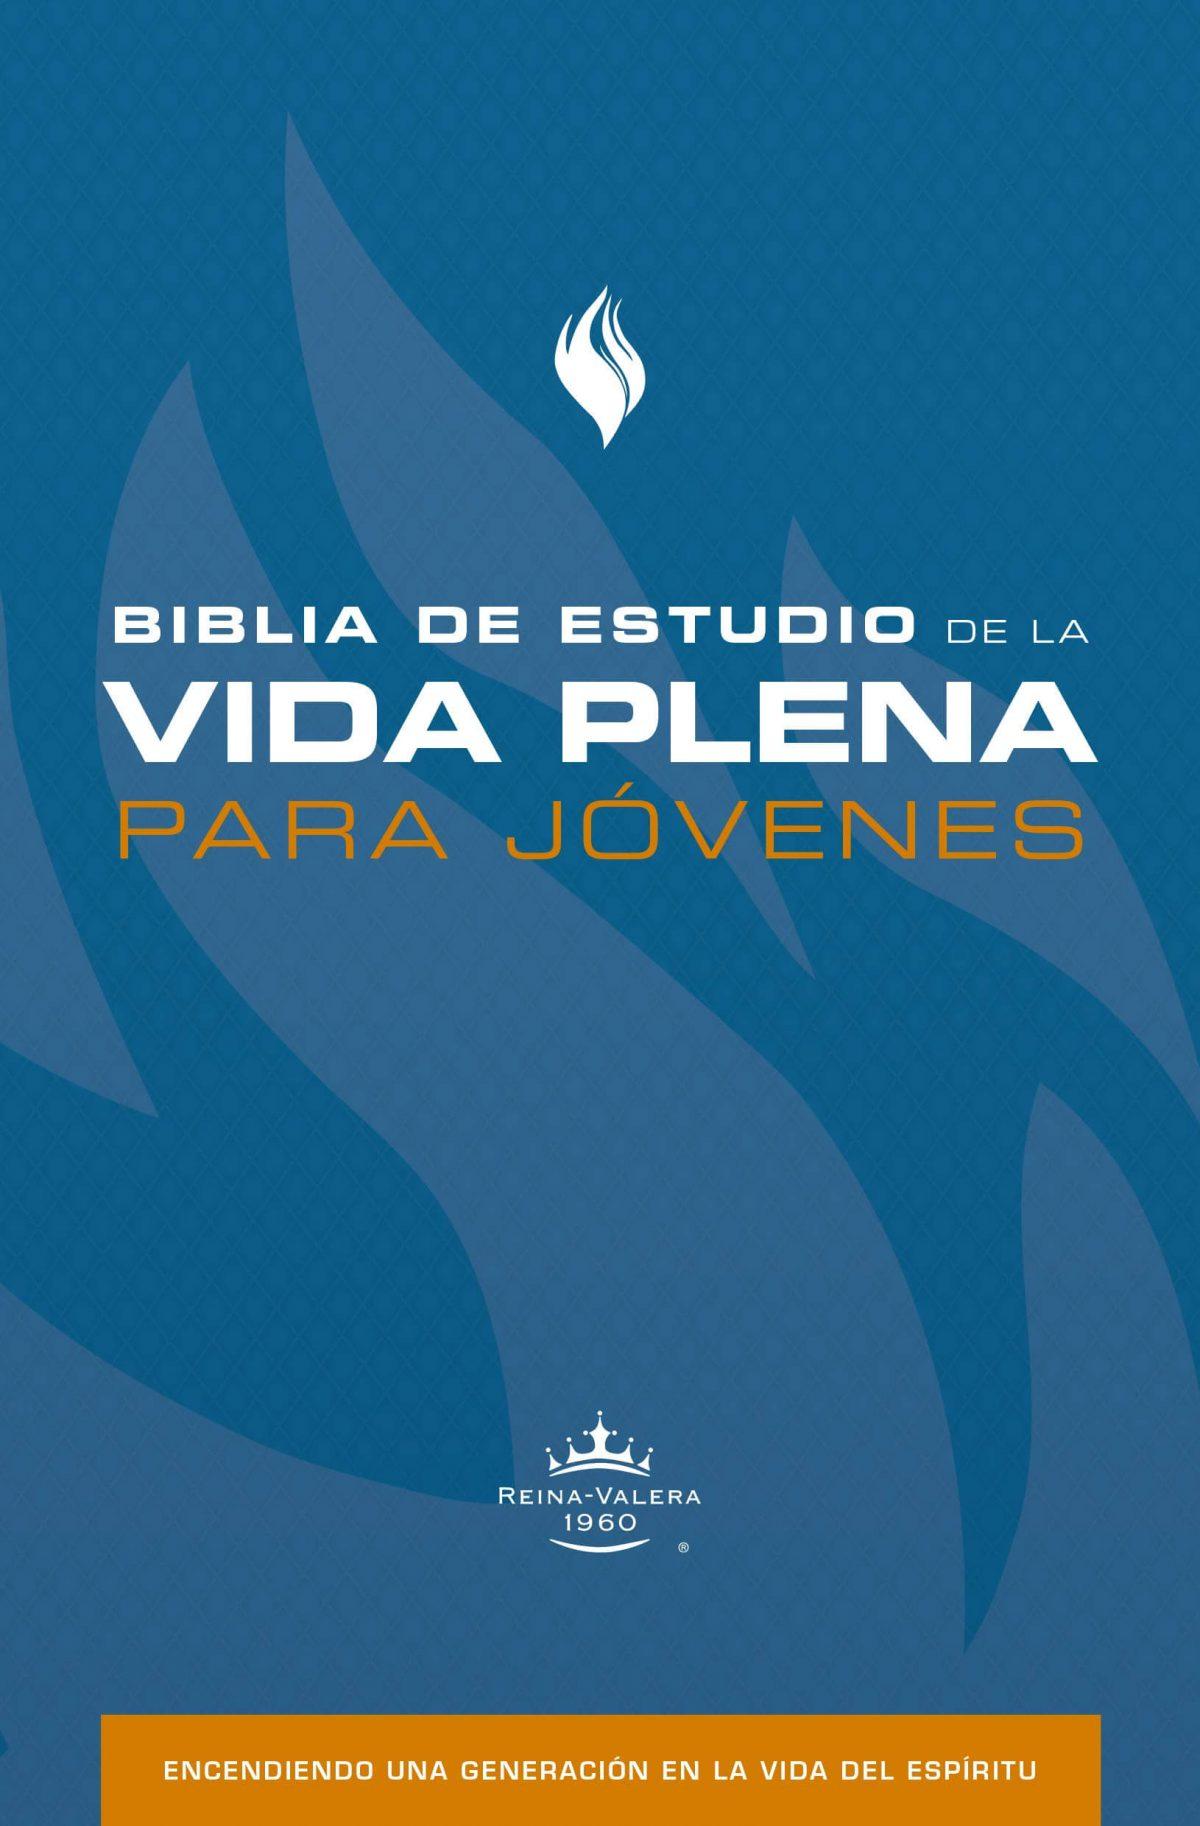 BIBLIA DE ESTUDIO DE LA VIDA PLENA PARA JOVENES